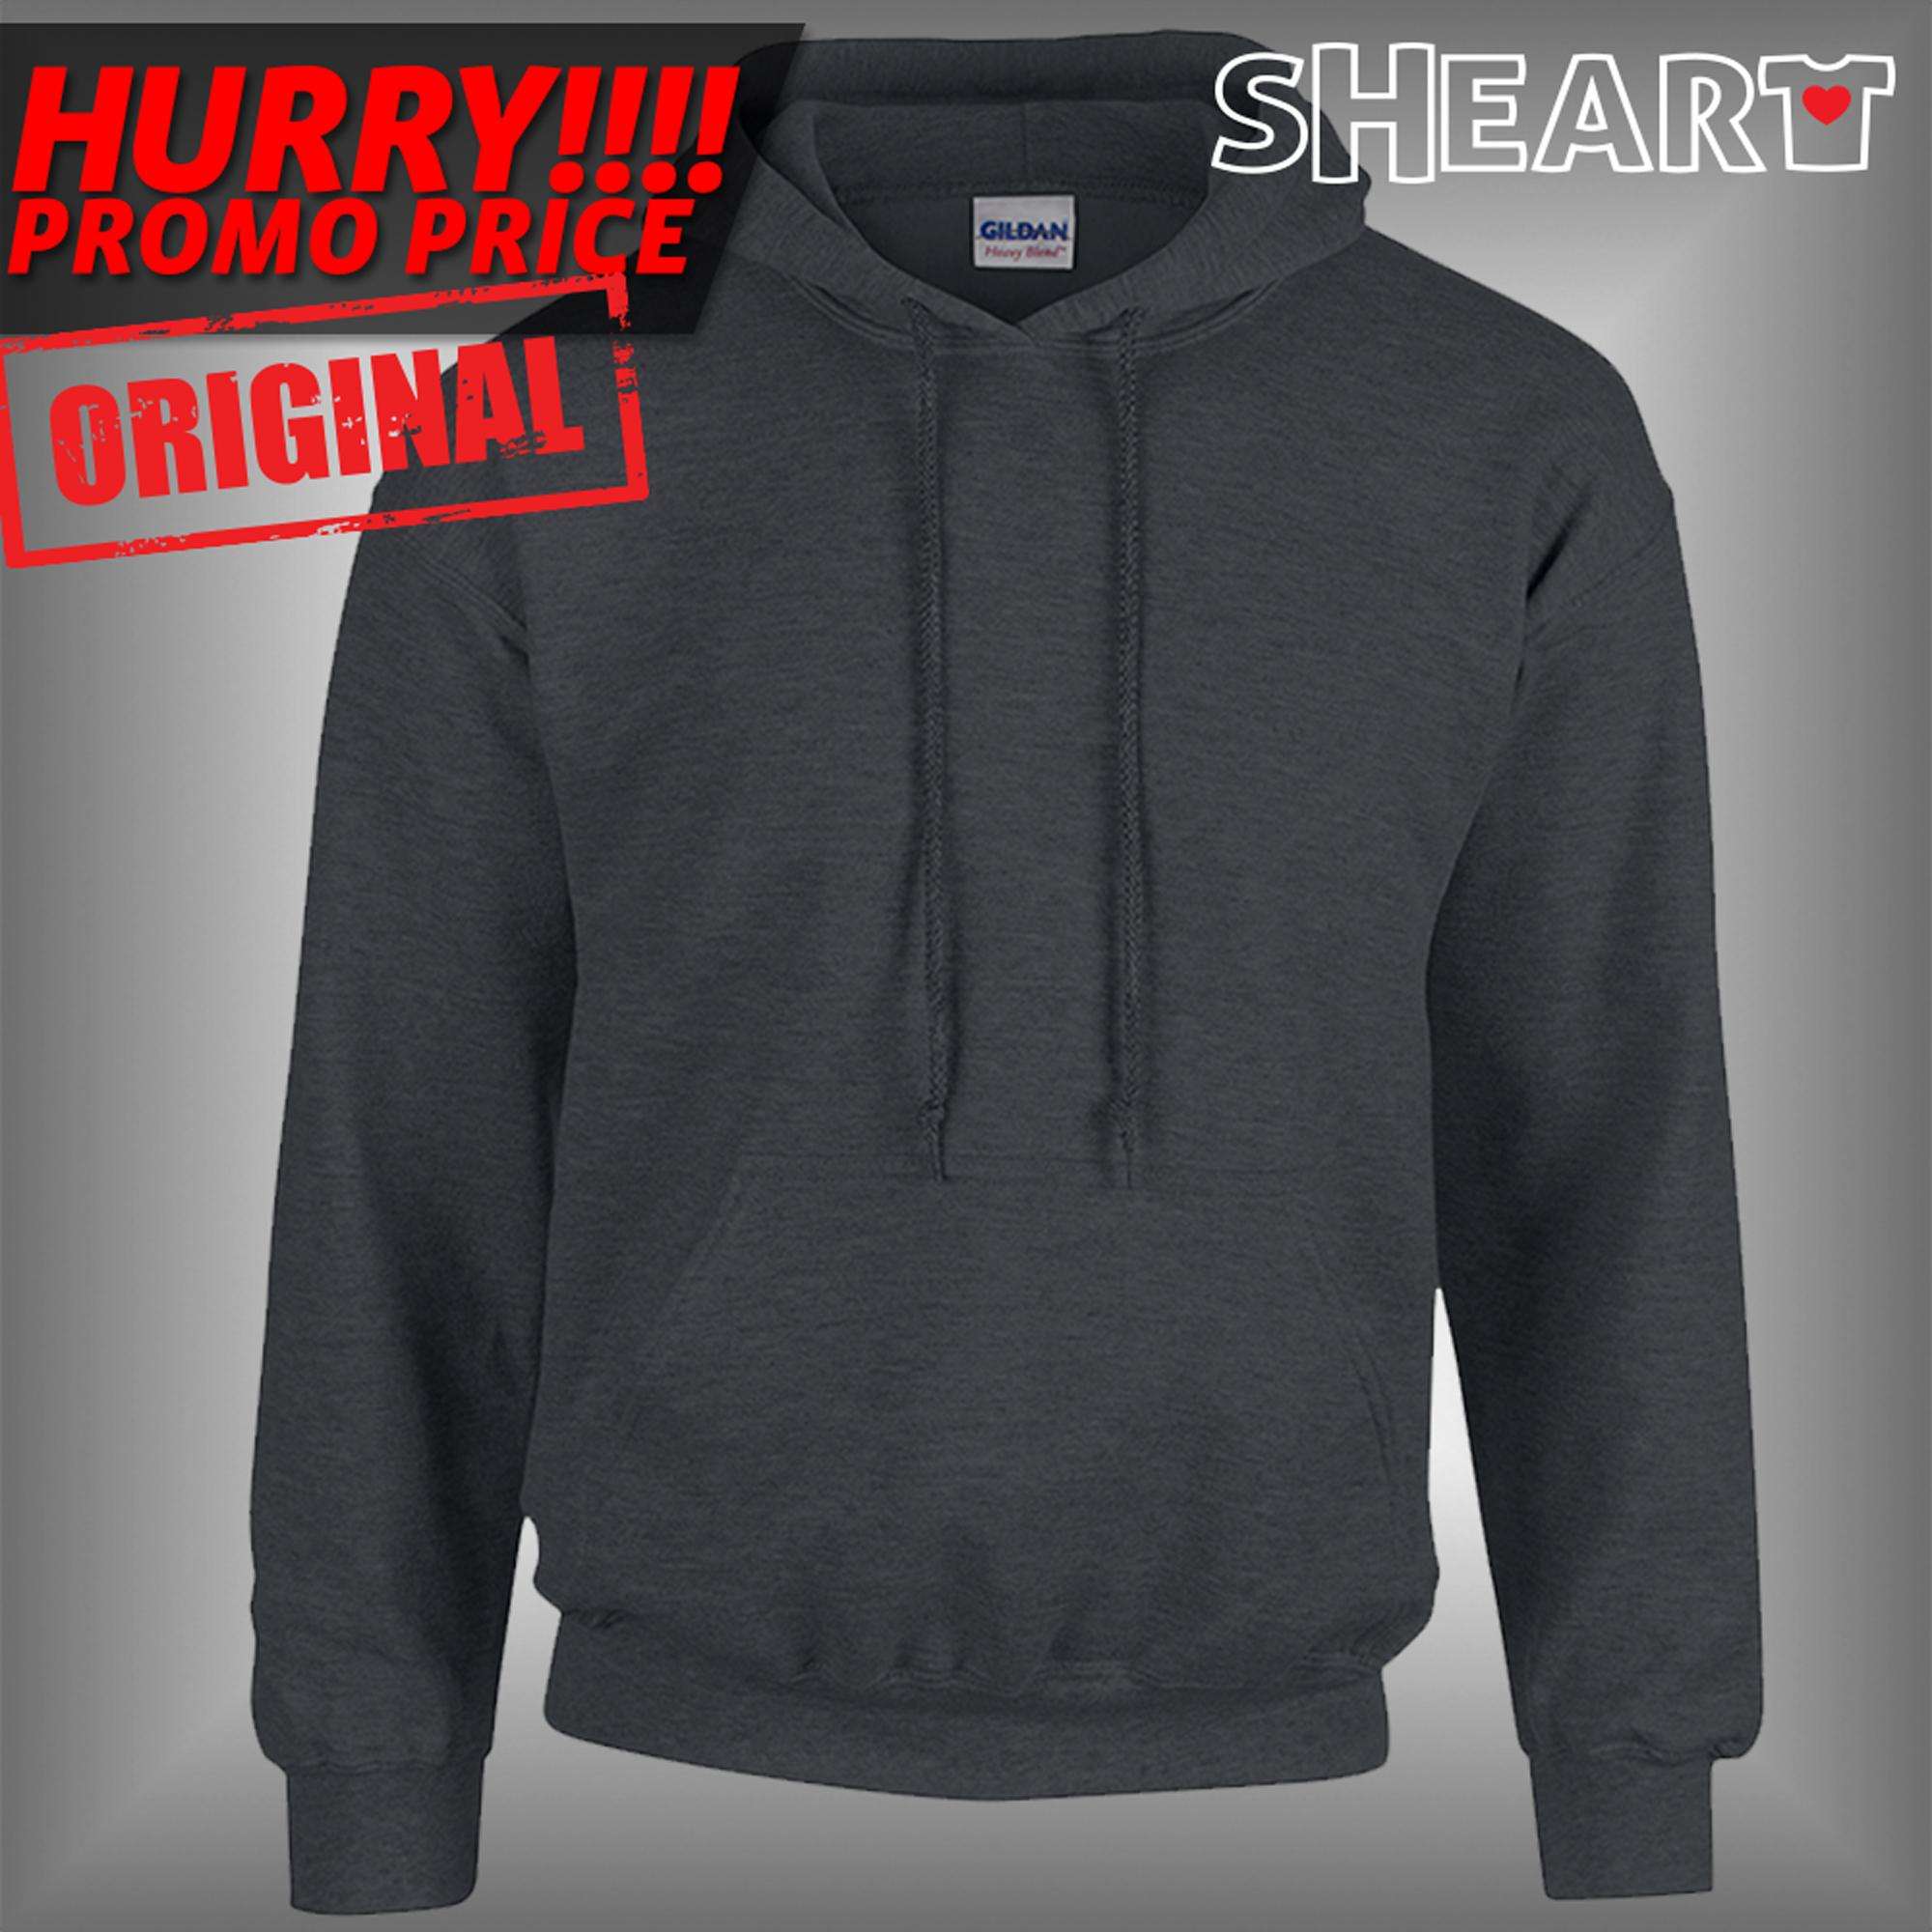 c8d6d14dc Mens Hoodies for sale - Hoodie Jackets for Men online brands